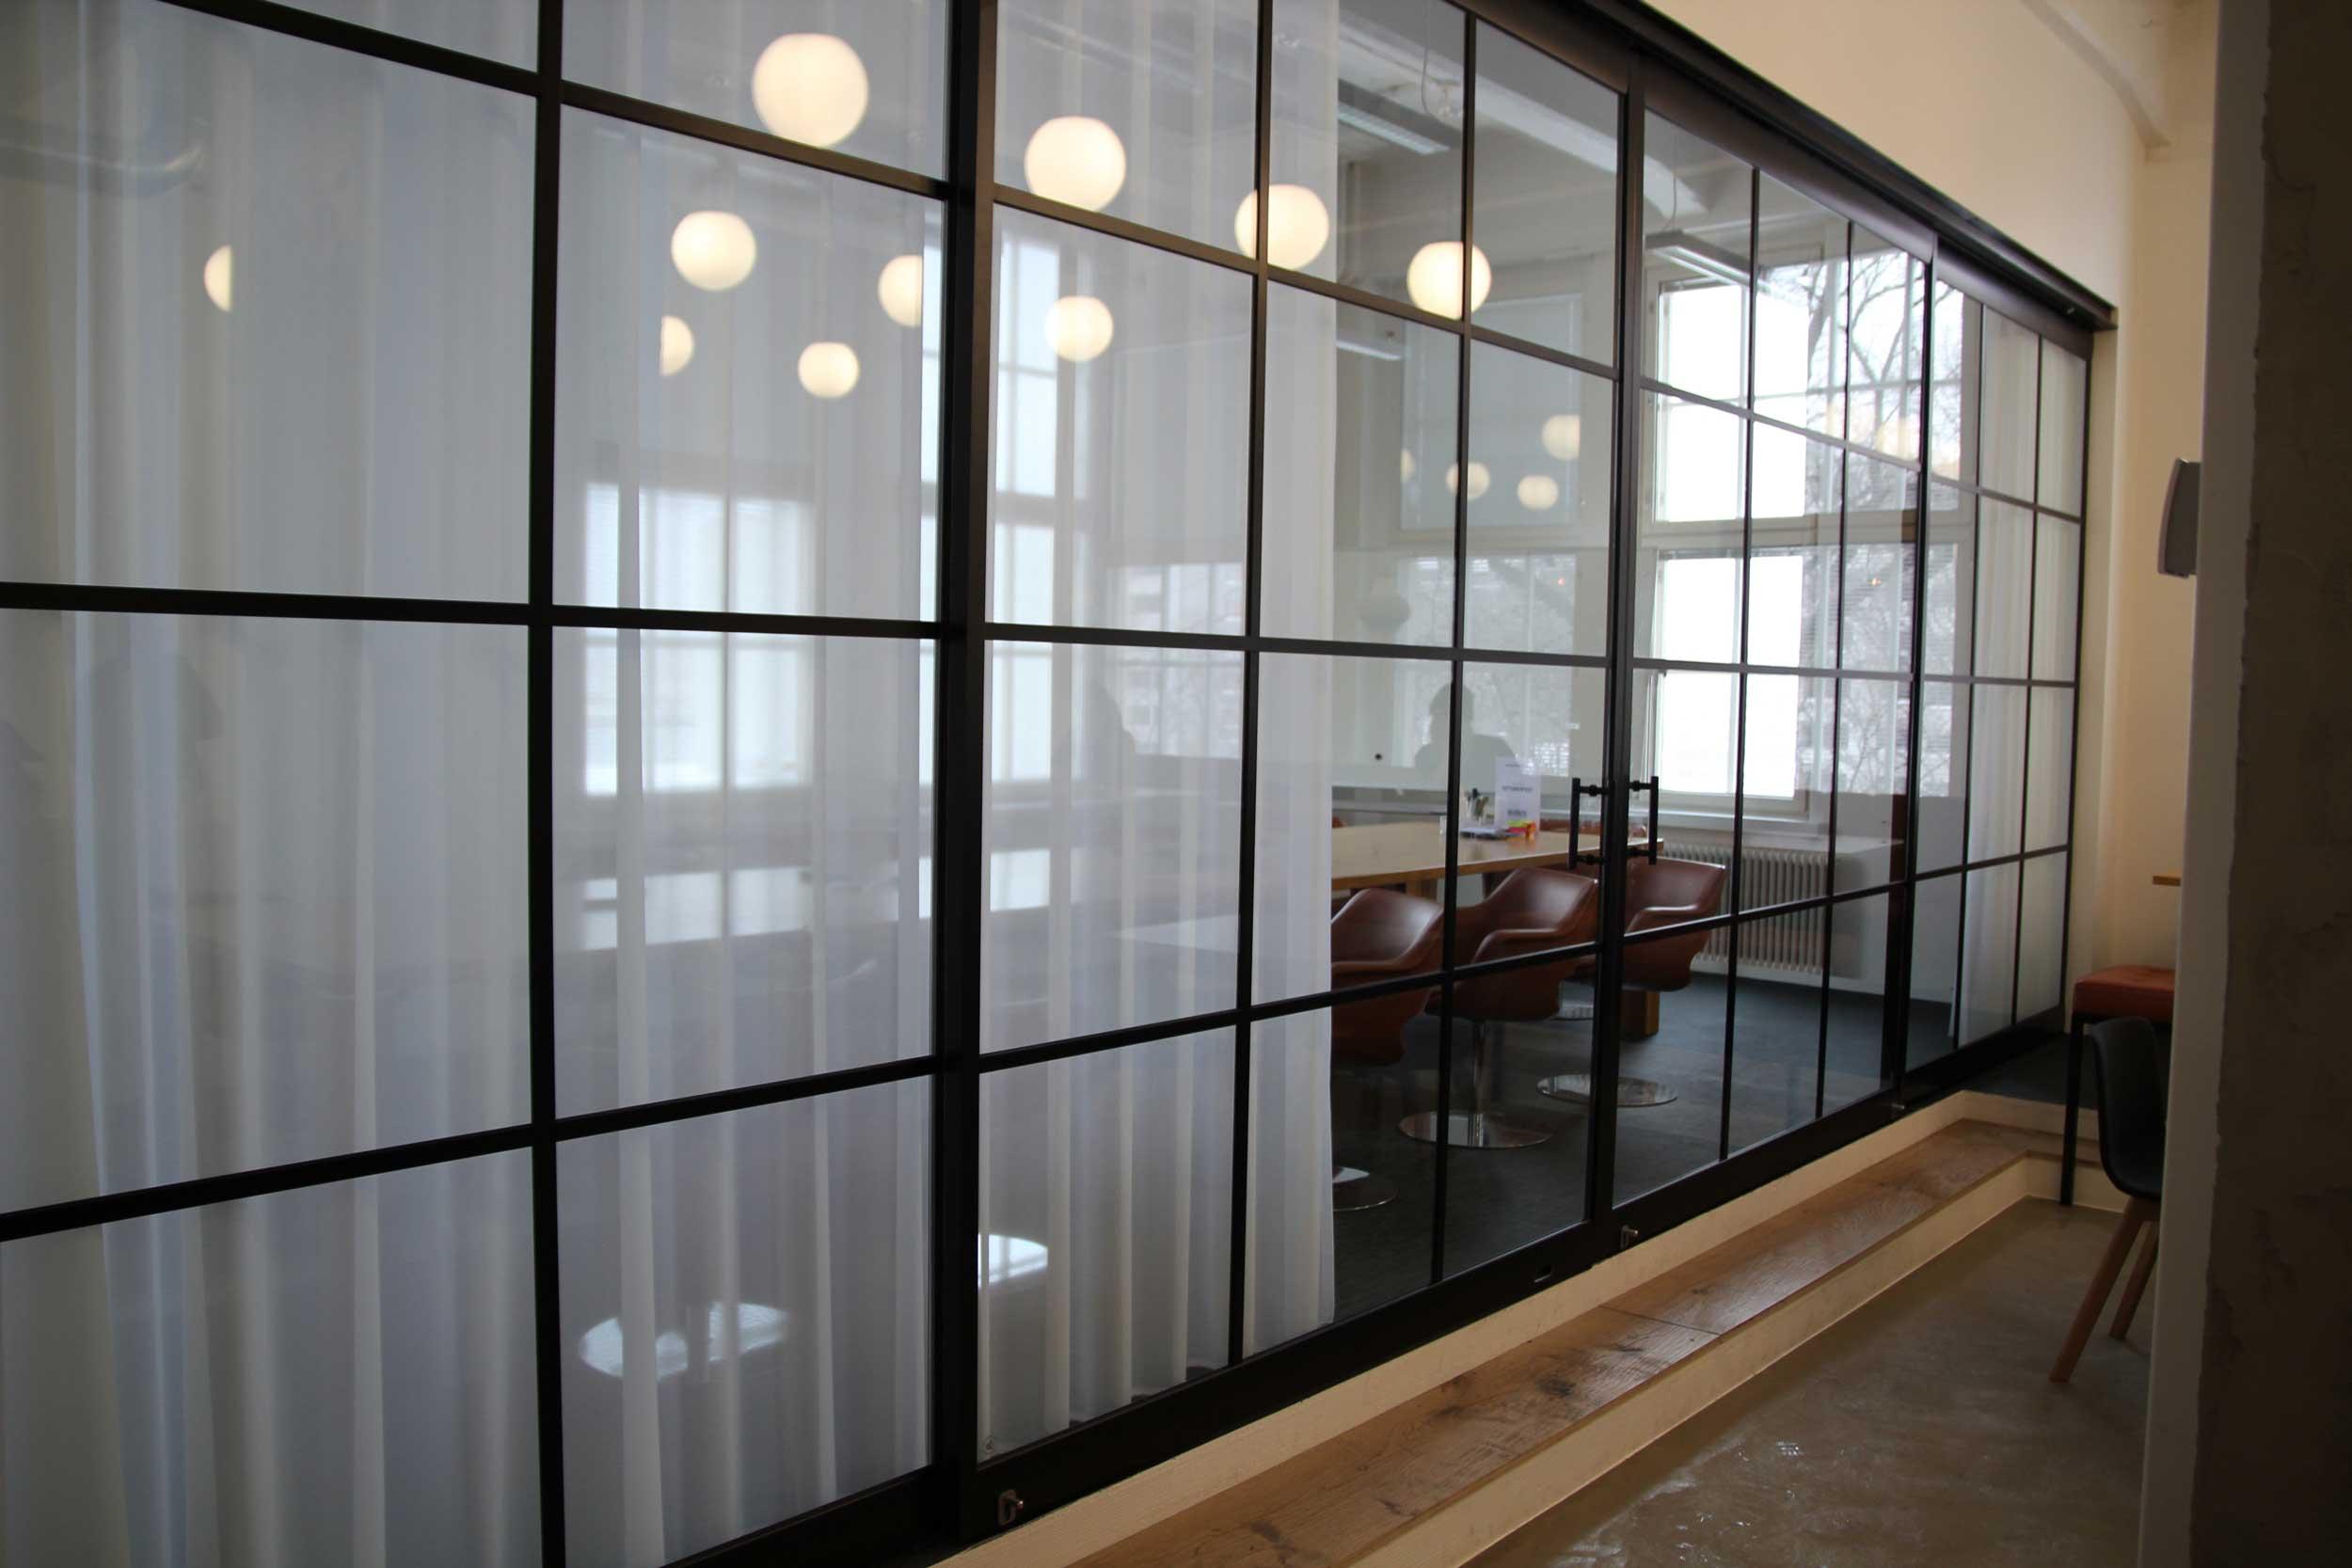 Scanmikael Soundproof glass walls_Merikortteli, Helsinki